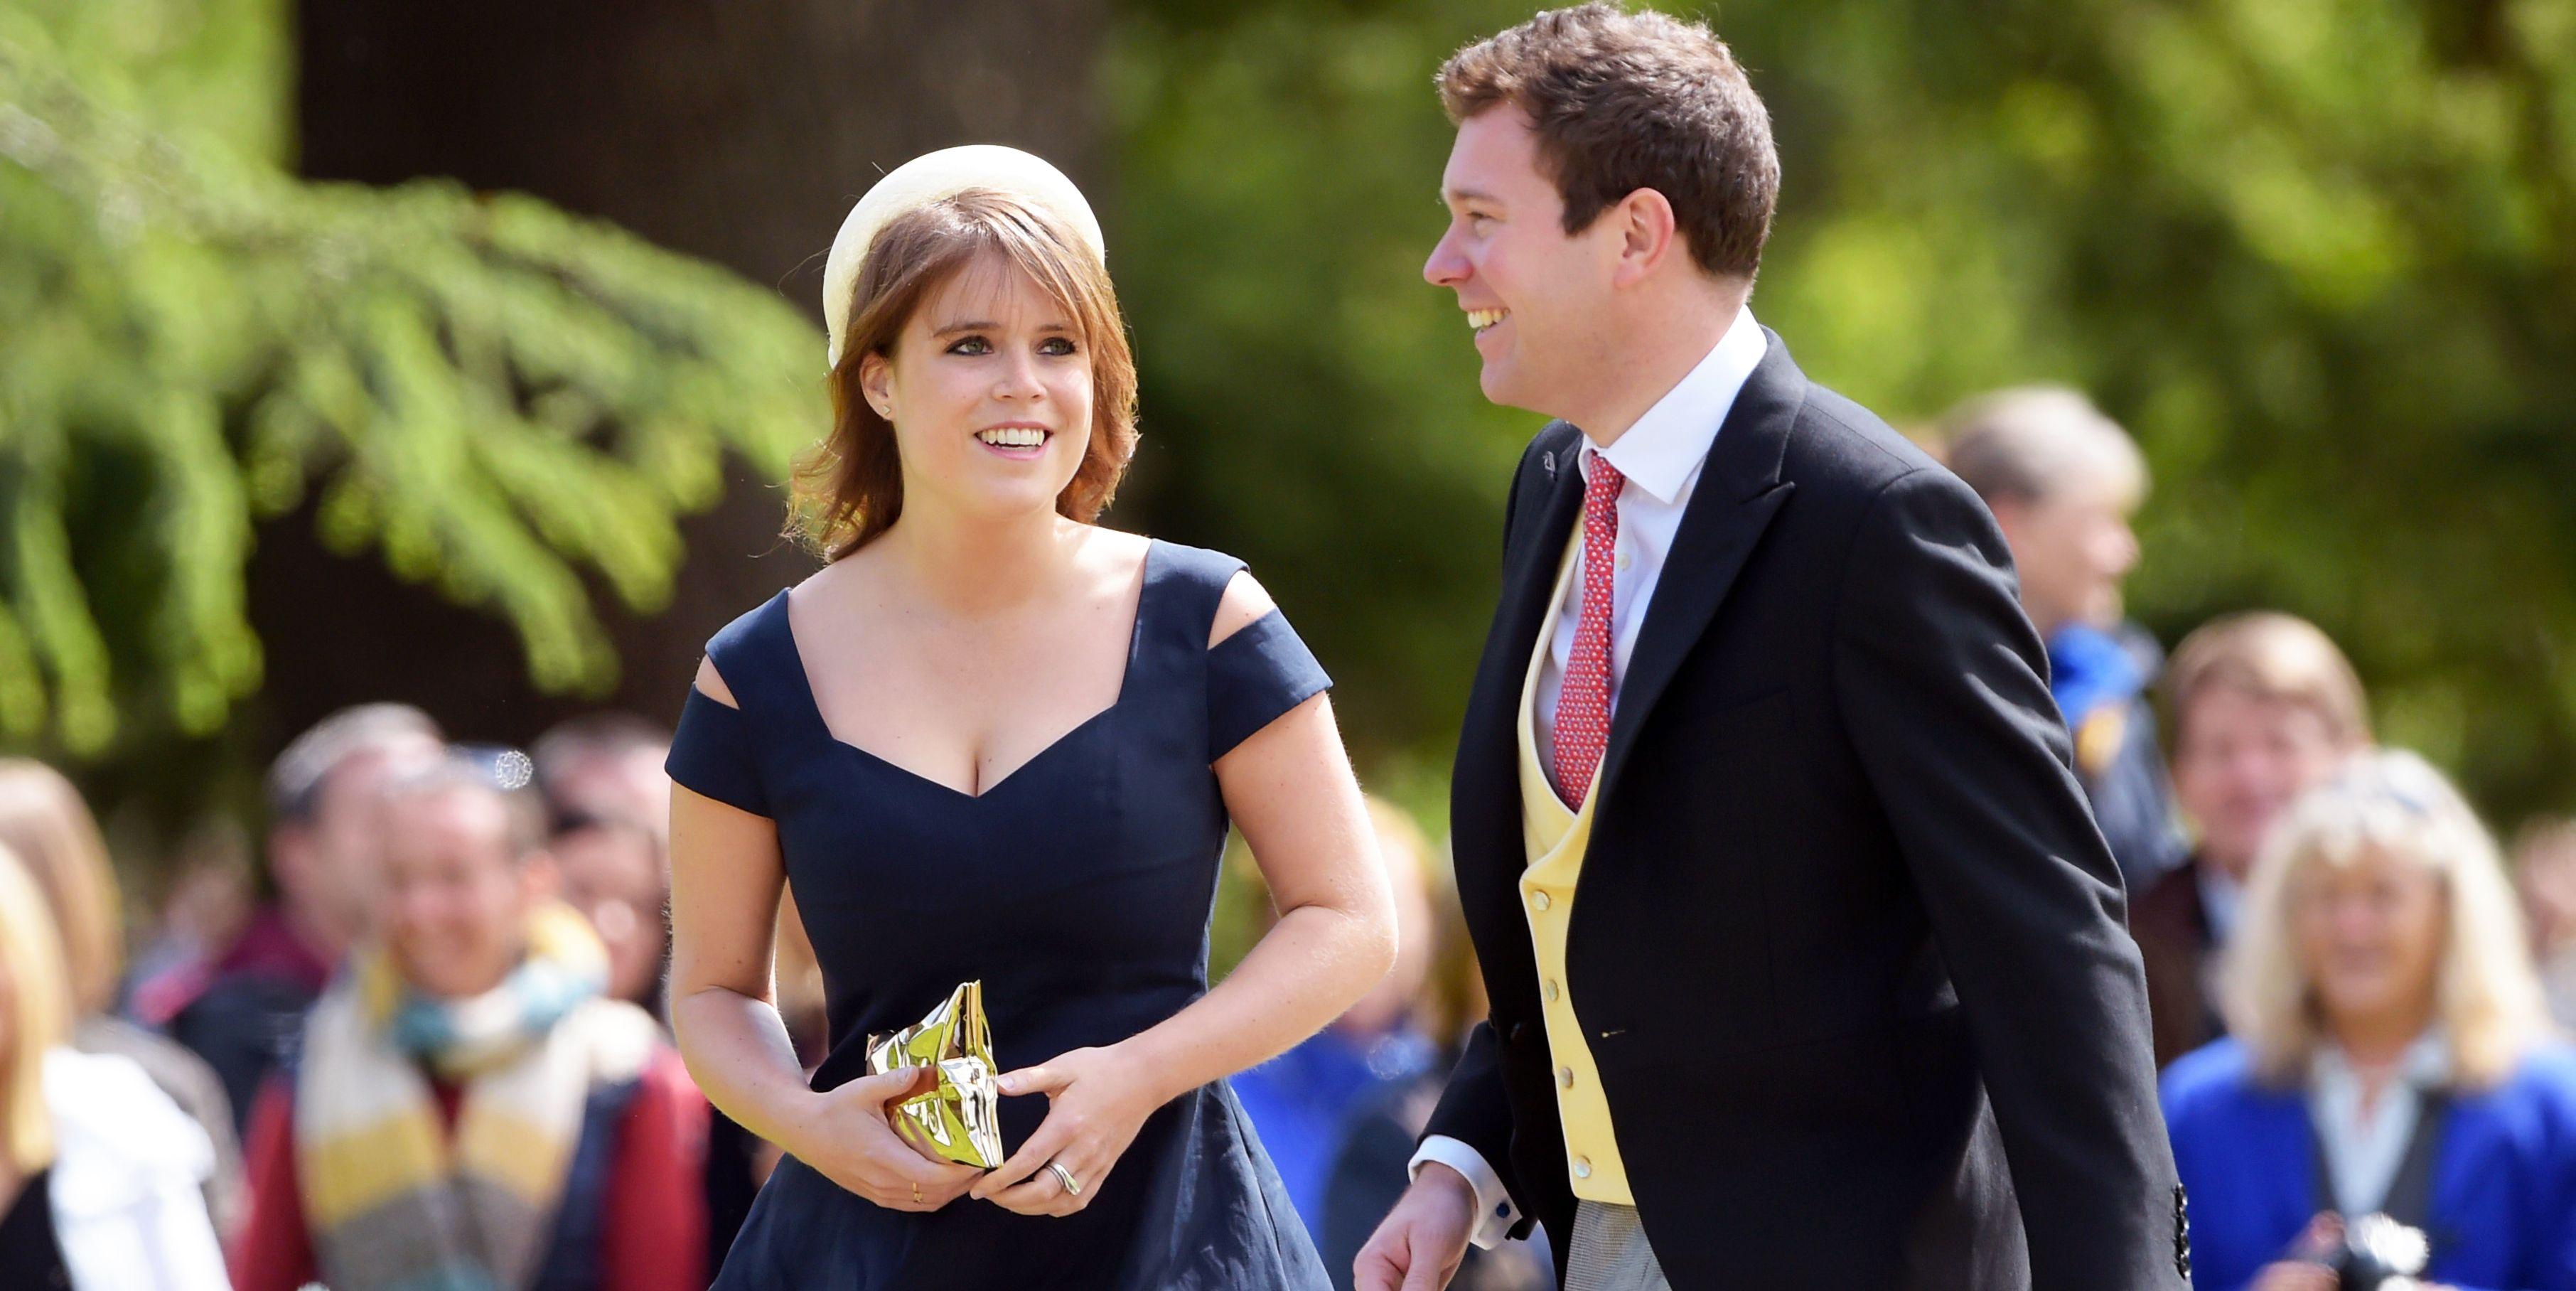 Wedding of James Matthews and Pippa Middleton, St Mark's Church, Englefield, UK - 20 May 2017